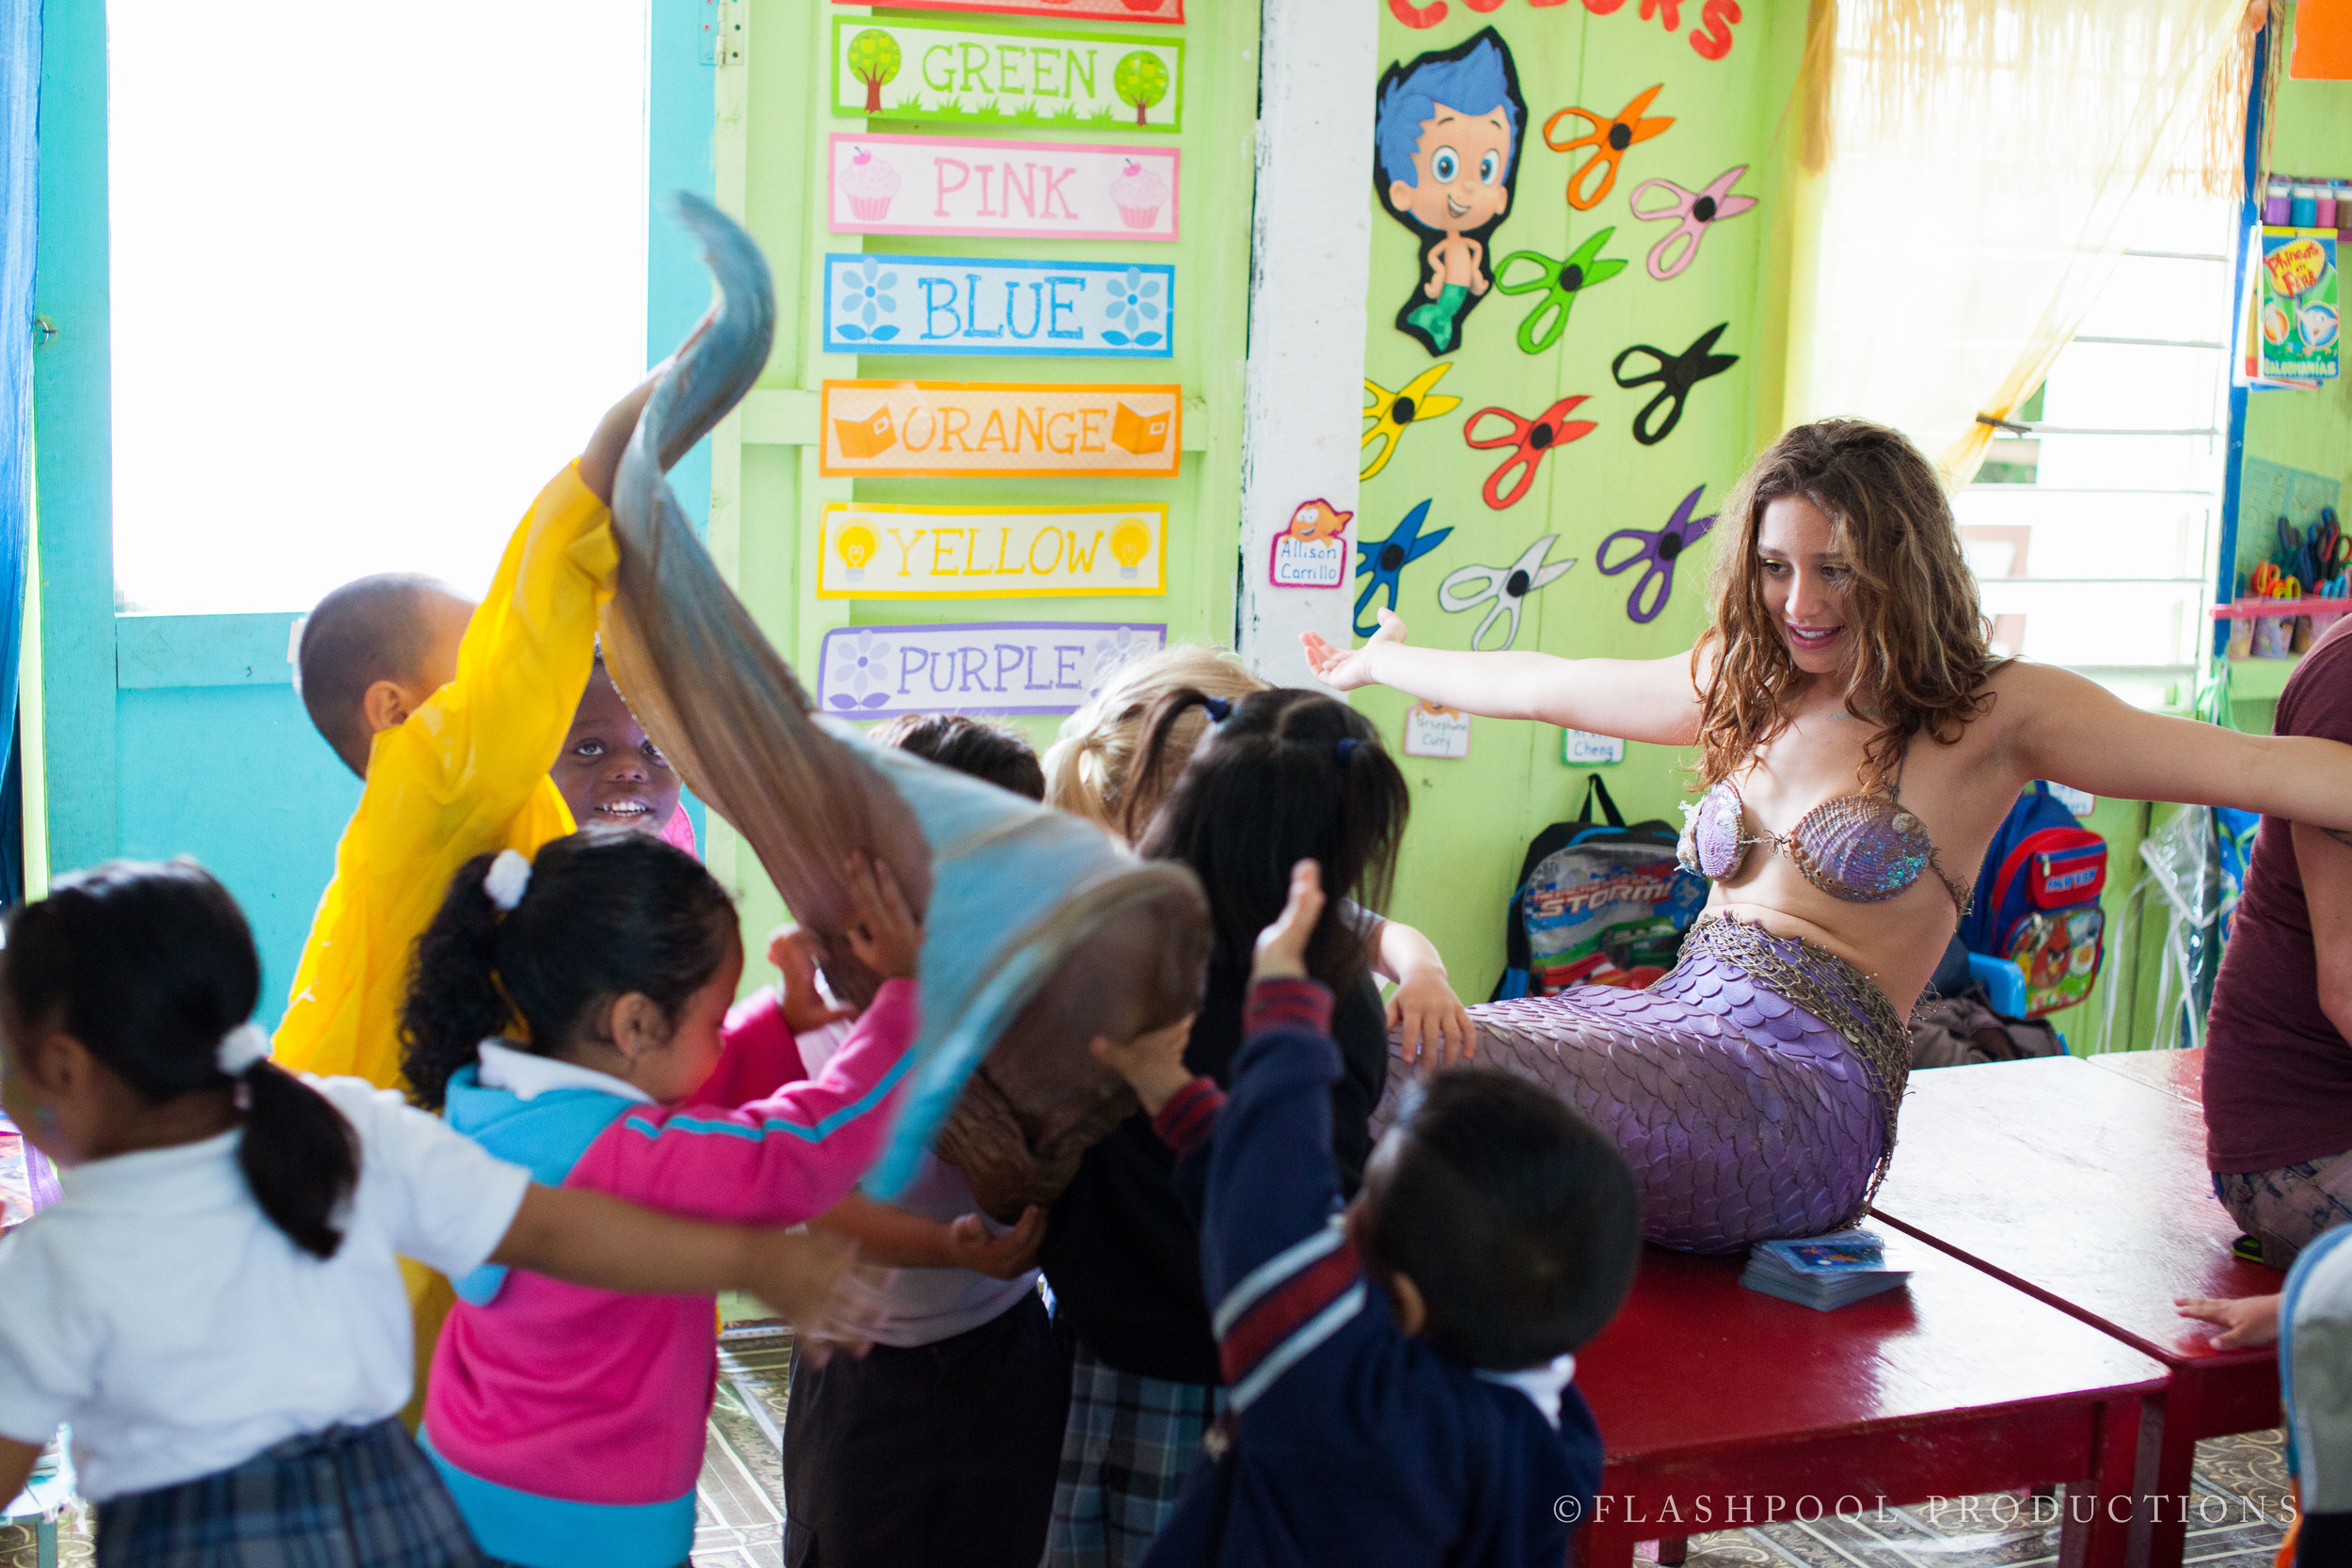 mermaidbzschool (74 of 89)-ZF-5394-55390-1-001-062.jpg